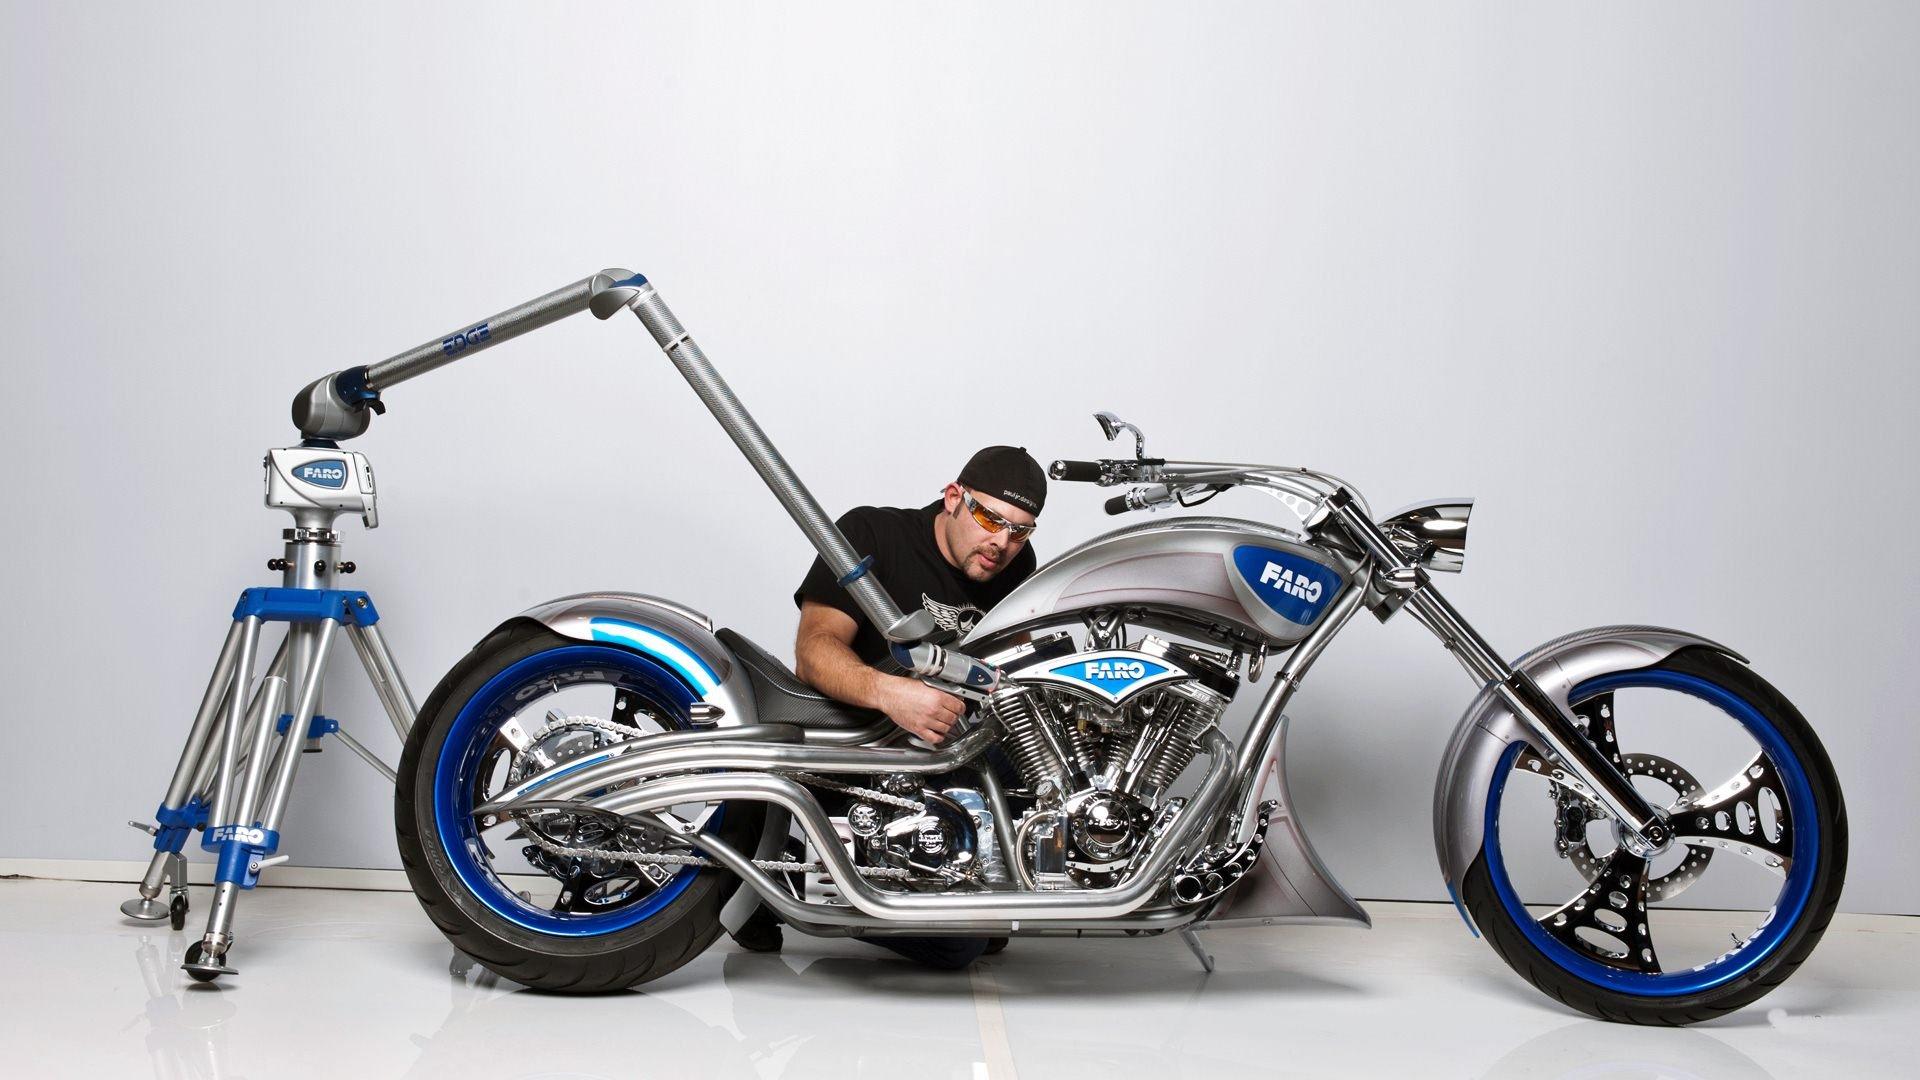 chopper vehicles motorbikes - photo #31